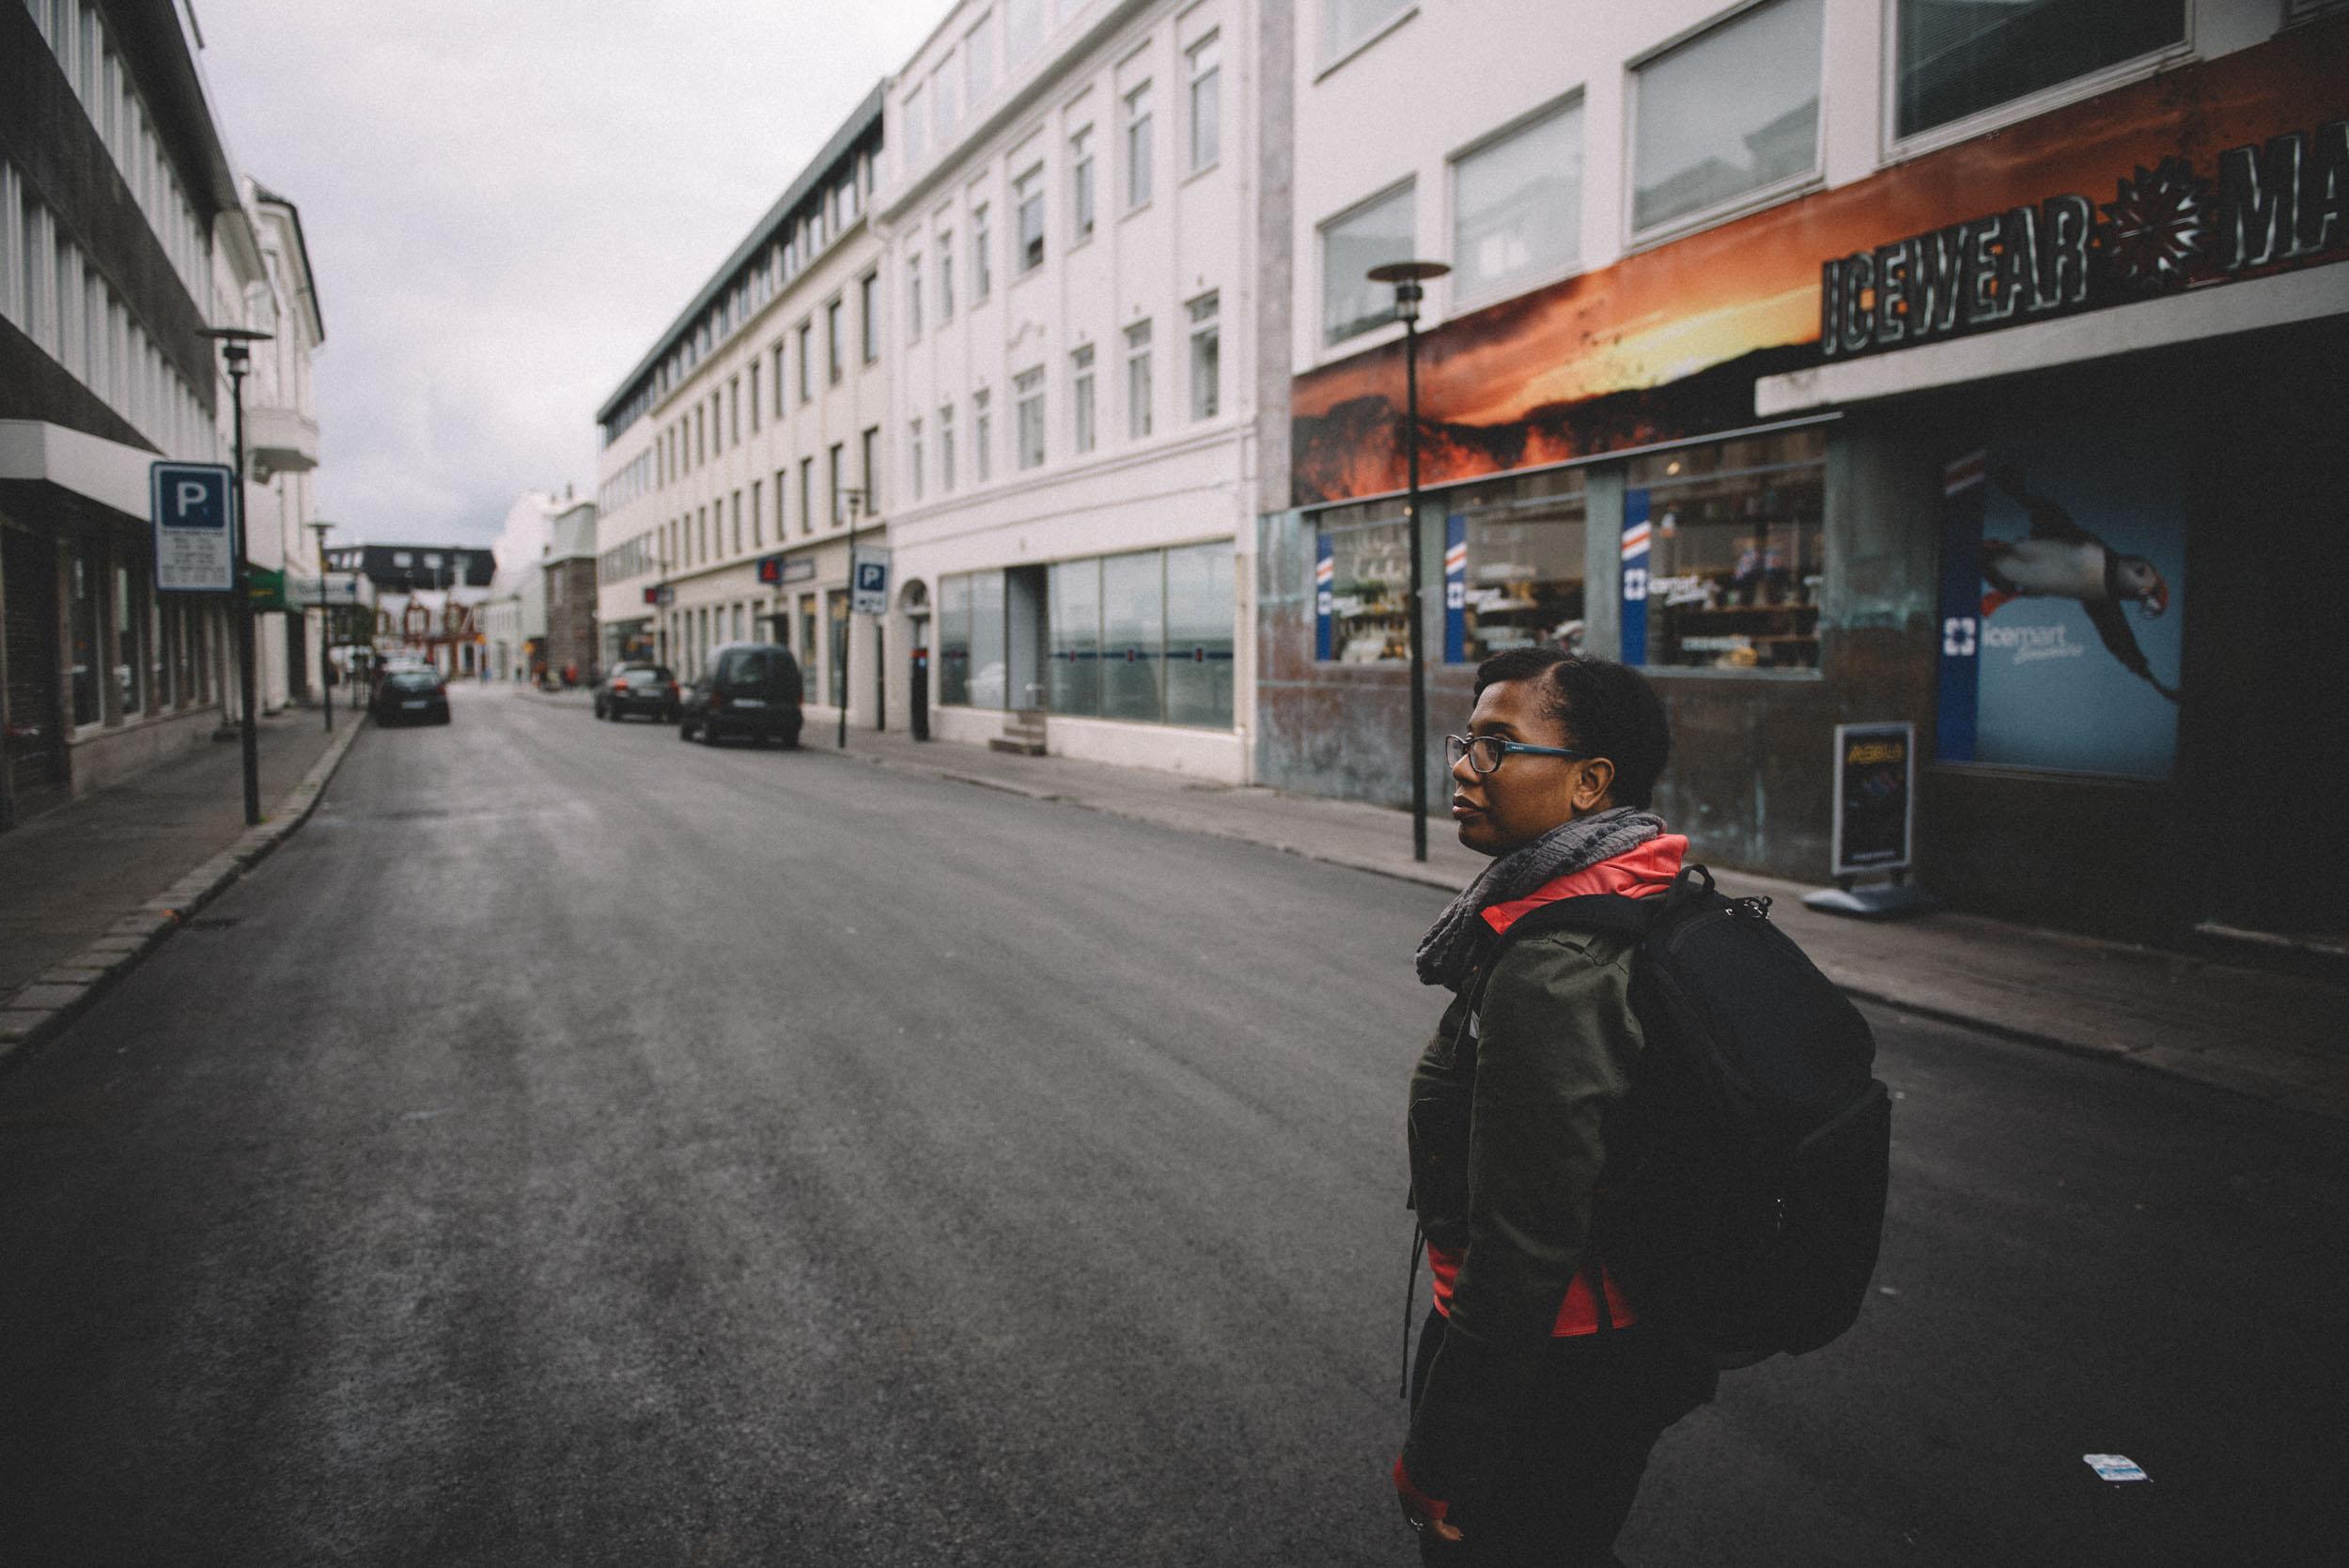 Iceland-trip-1.jpg